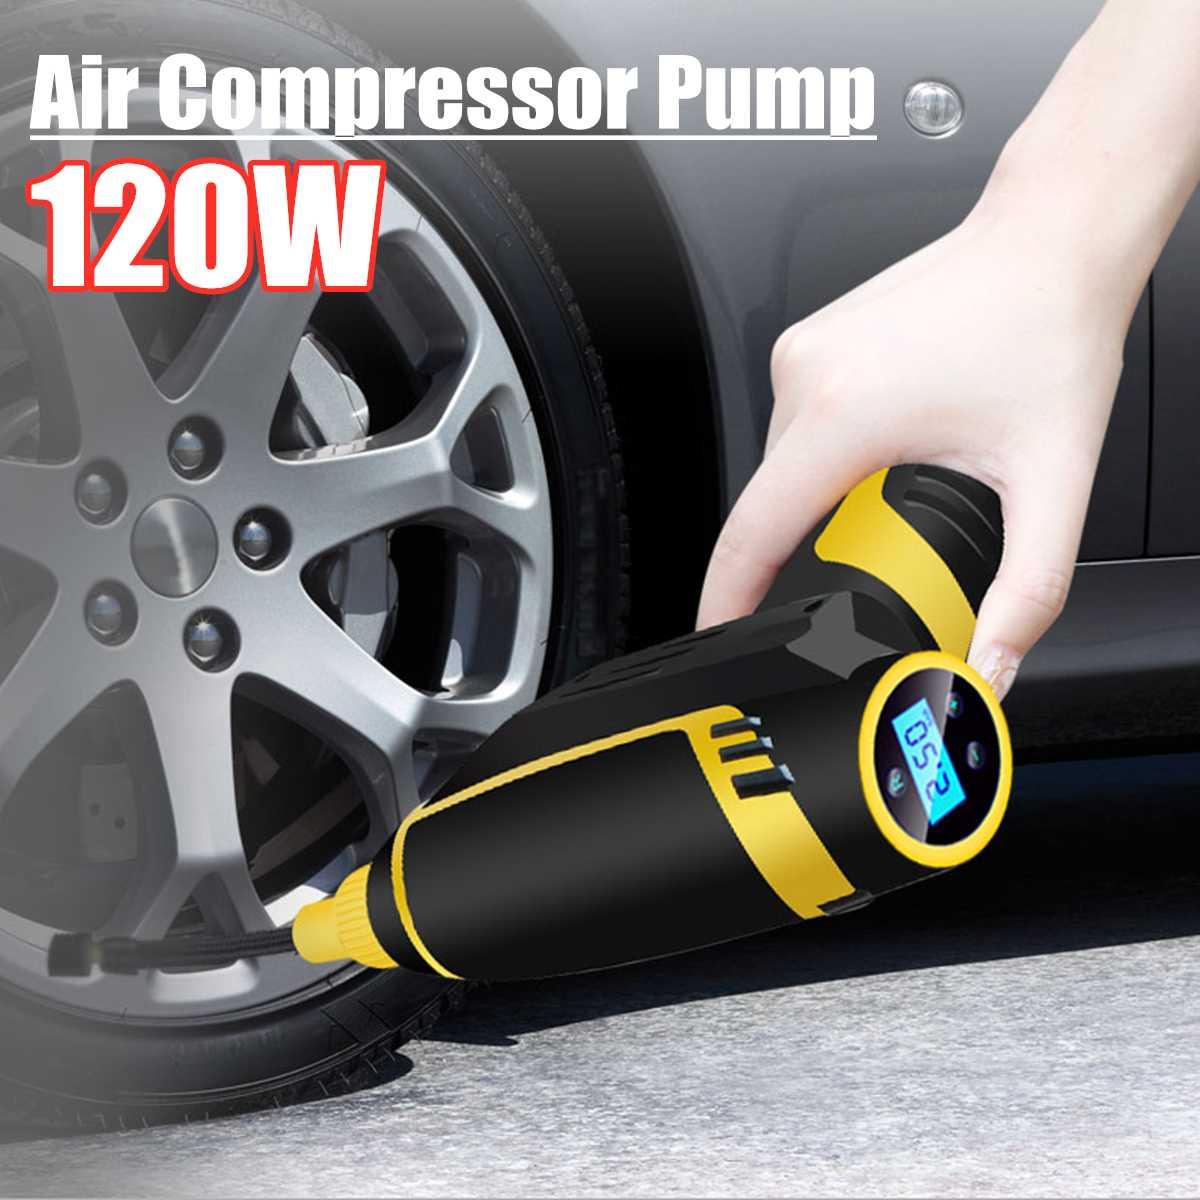 Wireless Car Tire Inflator Air Compressor Inflatable Pump Pressure Gauge Cigarette Lighter USB Motorcycles Car Bike Accessories